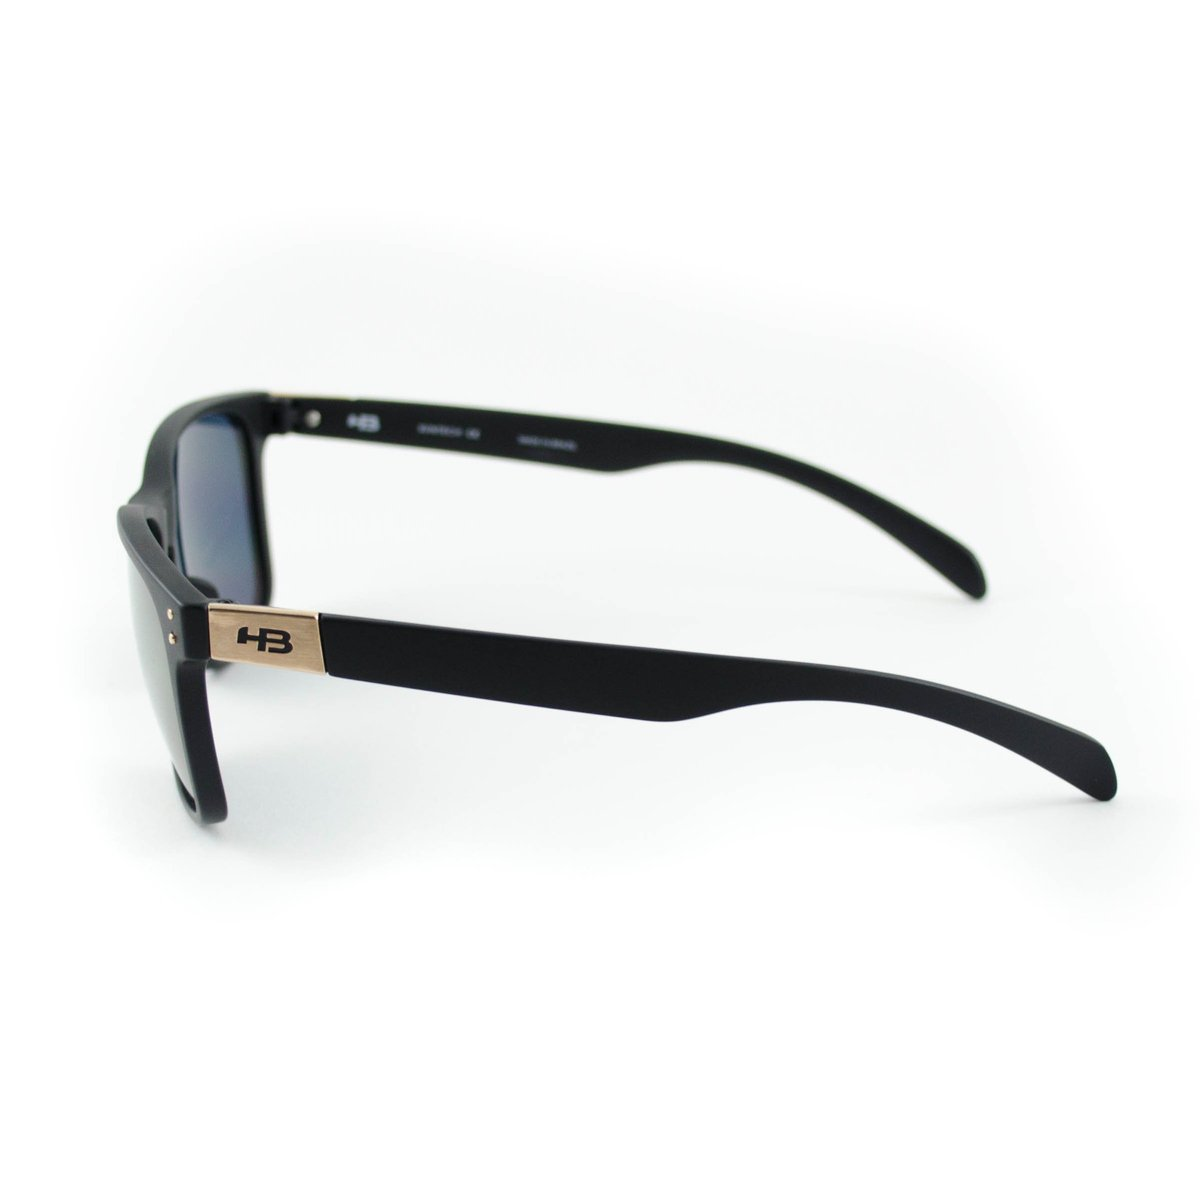 6c59d8e947eff Óculos de Sol HB Hot Buttered - Compre Agora   Zattini